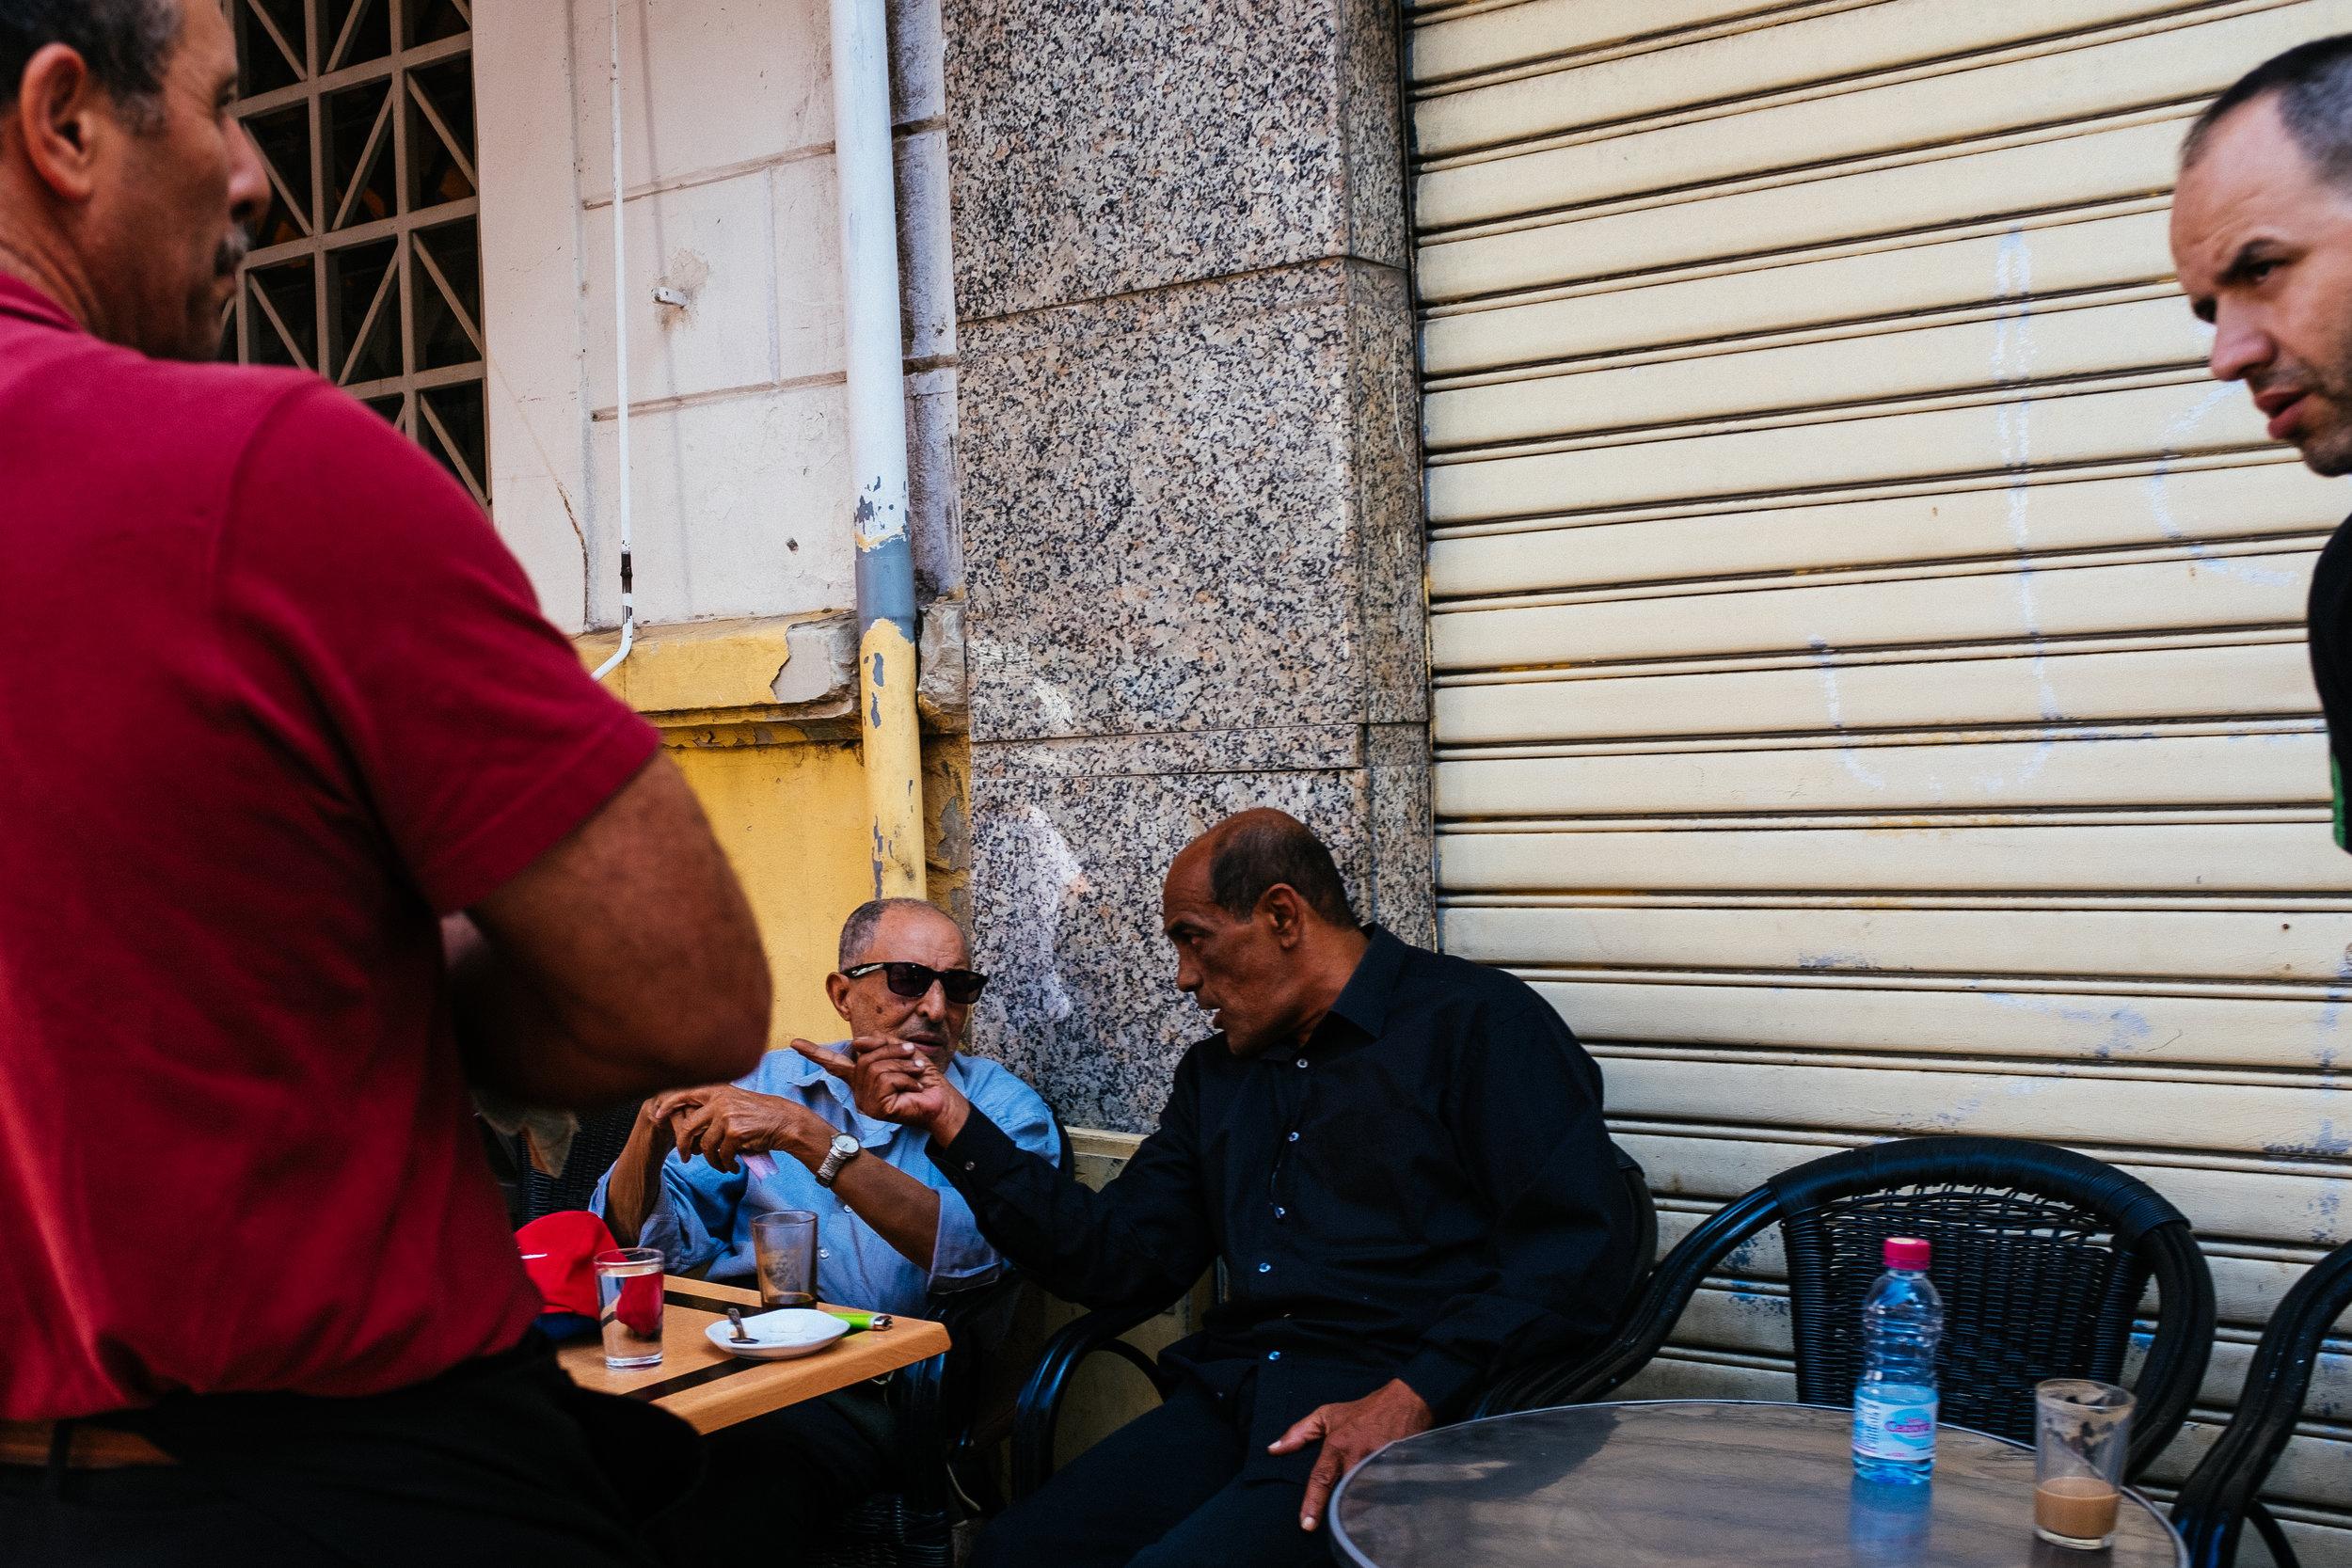 Tangier Morocco, 2018